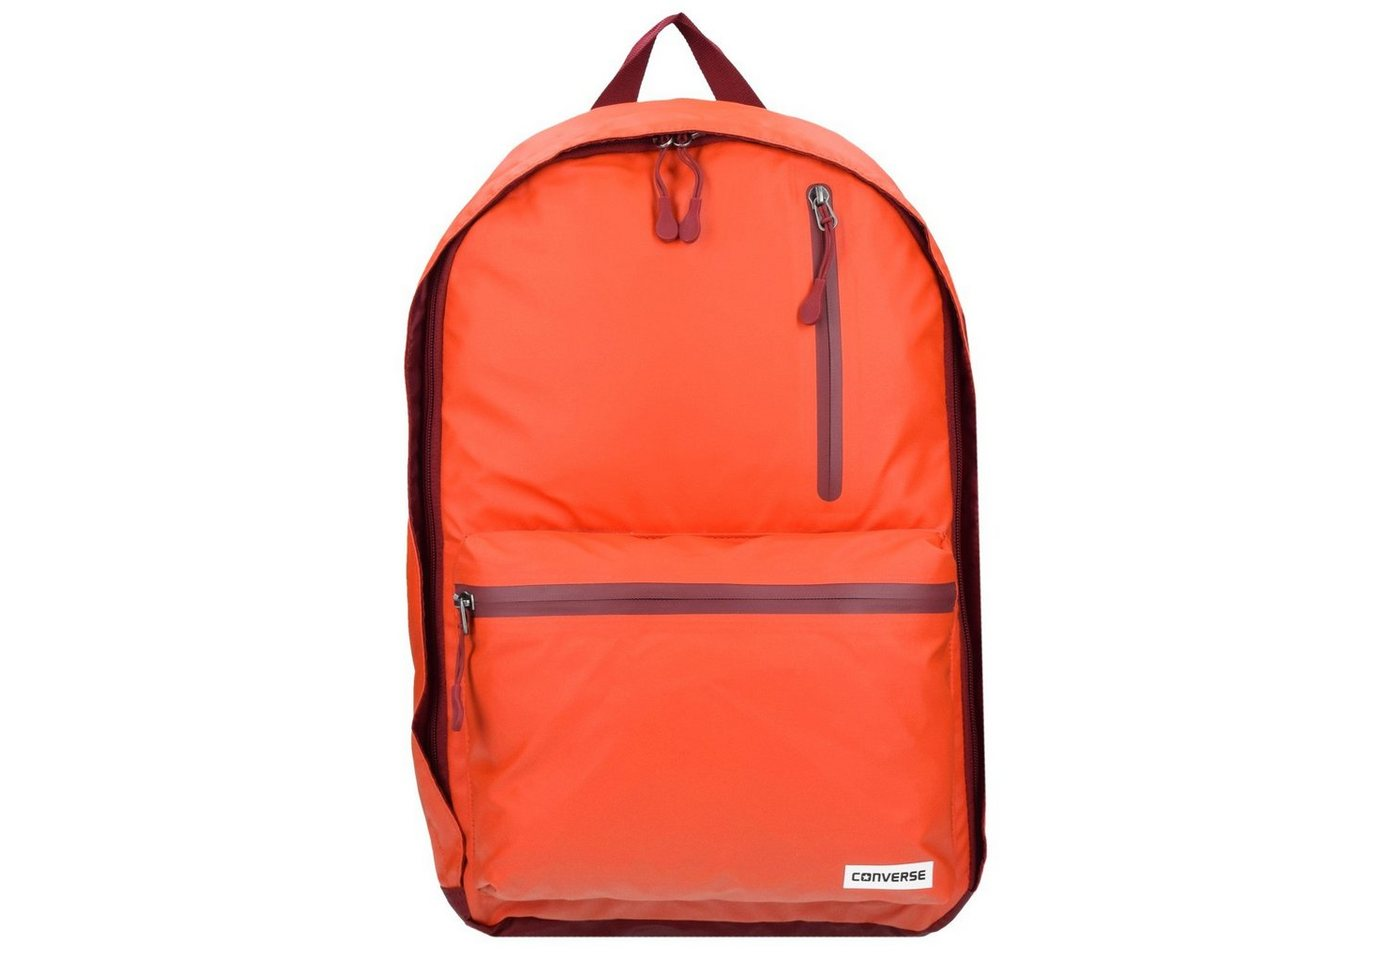 CONVERSE All Star Rubber Backpack Rucksack 44 cm Sale Angebote Ebrach